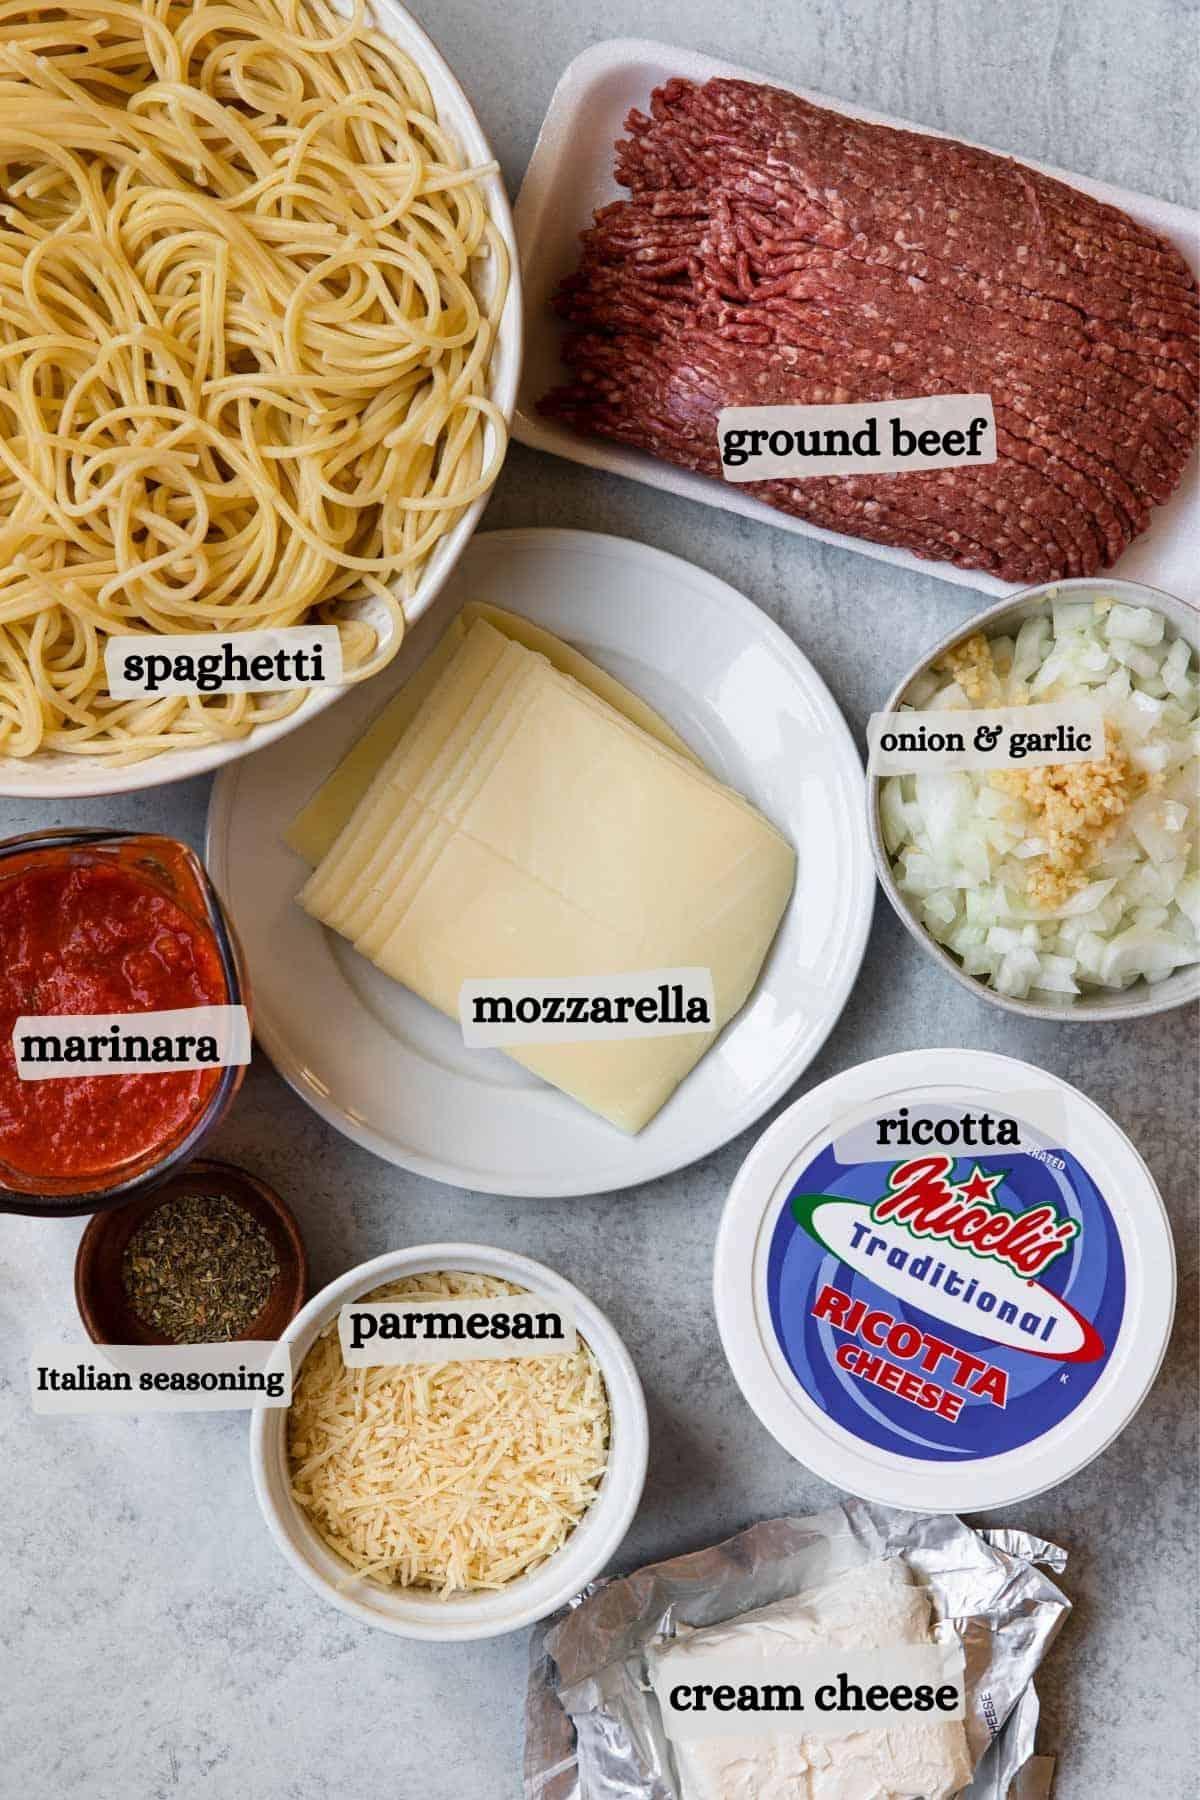 Spaghetti, ground beef, marinara, mozzarella, onion and garlic, Italian seasoning, parmesan, ricotta, creamcheese.